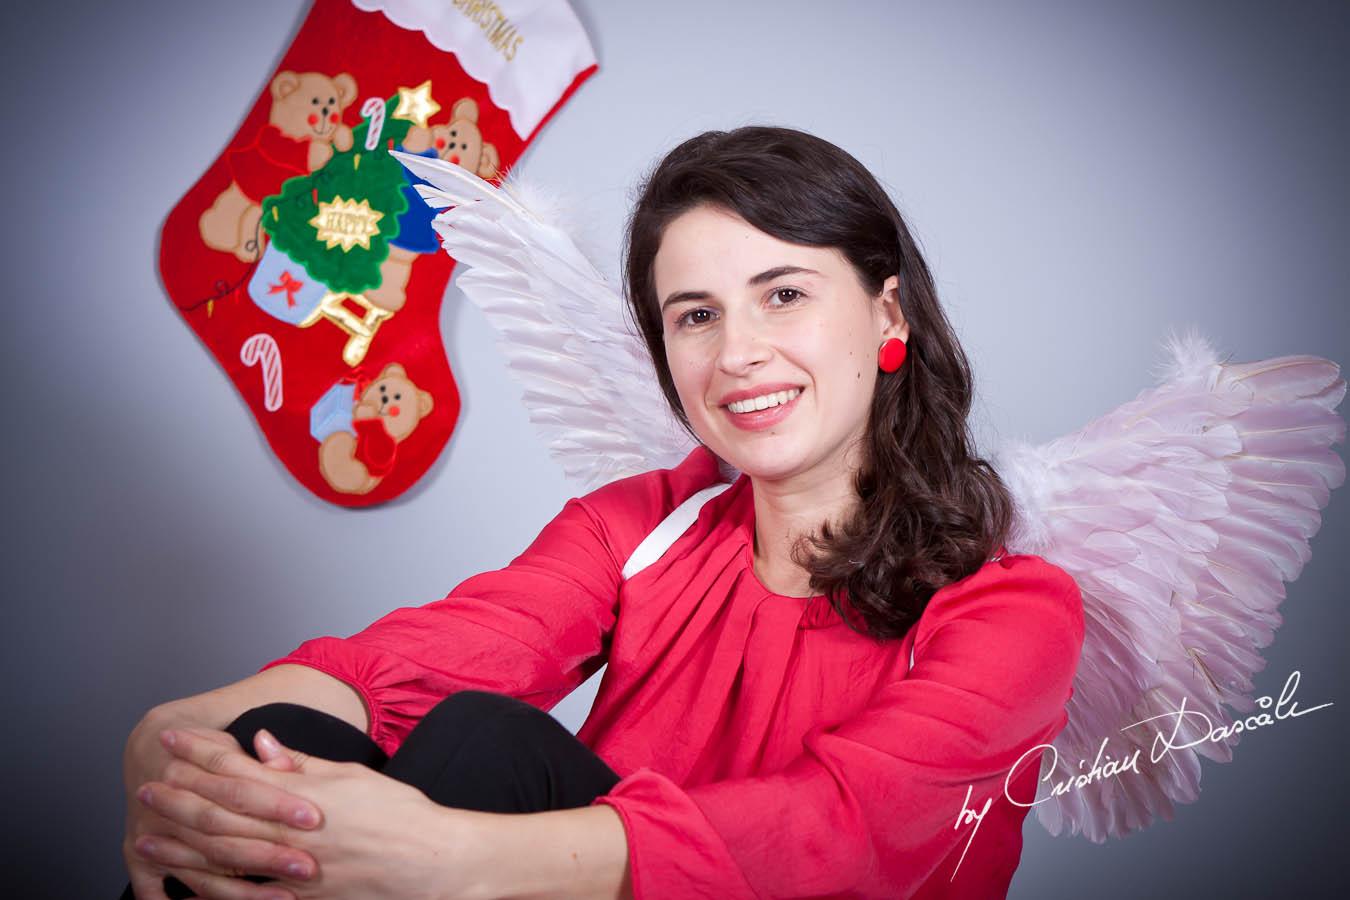 Sofia, Simona & Sorin - Christmas Photo Session by Photographer Cristian Dascalu